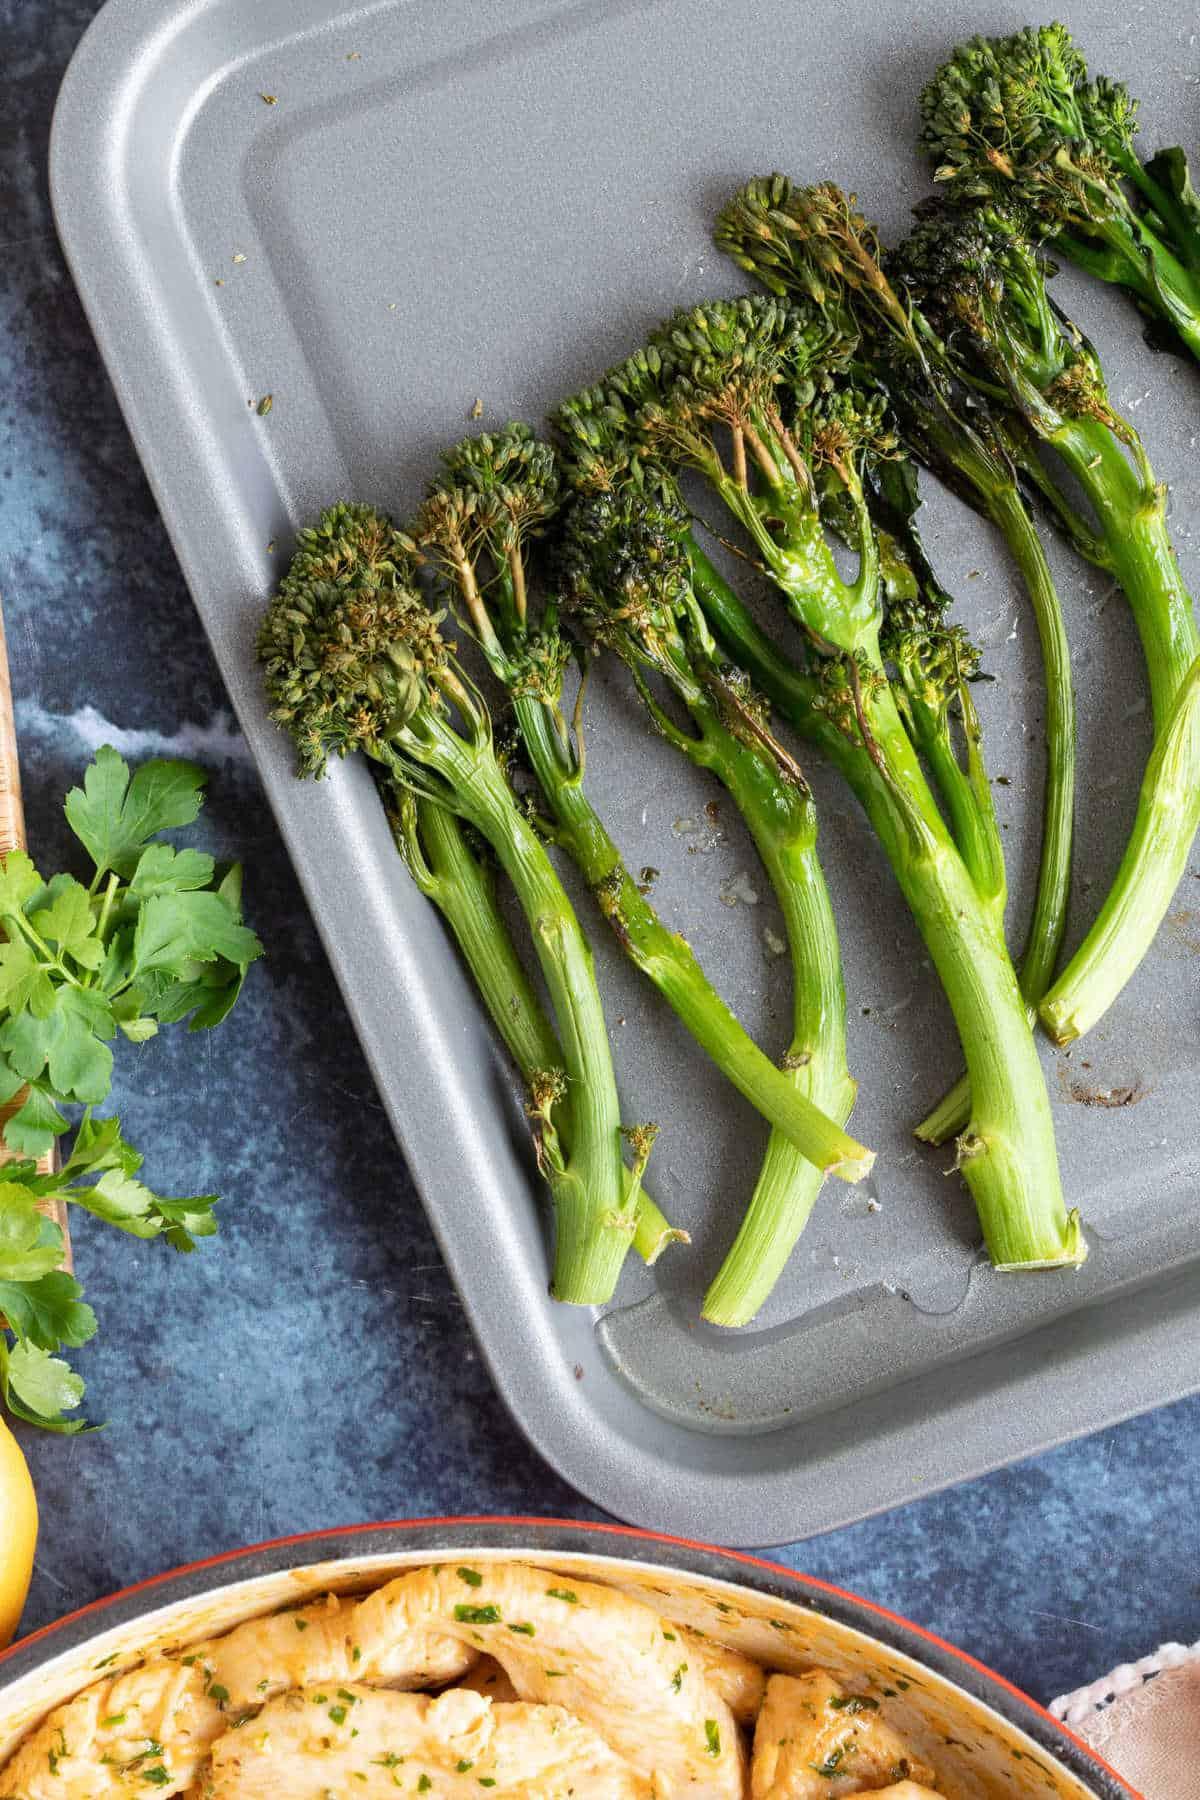 Tenderstem broccoli on a baking sheet.